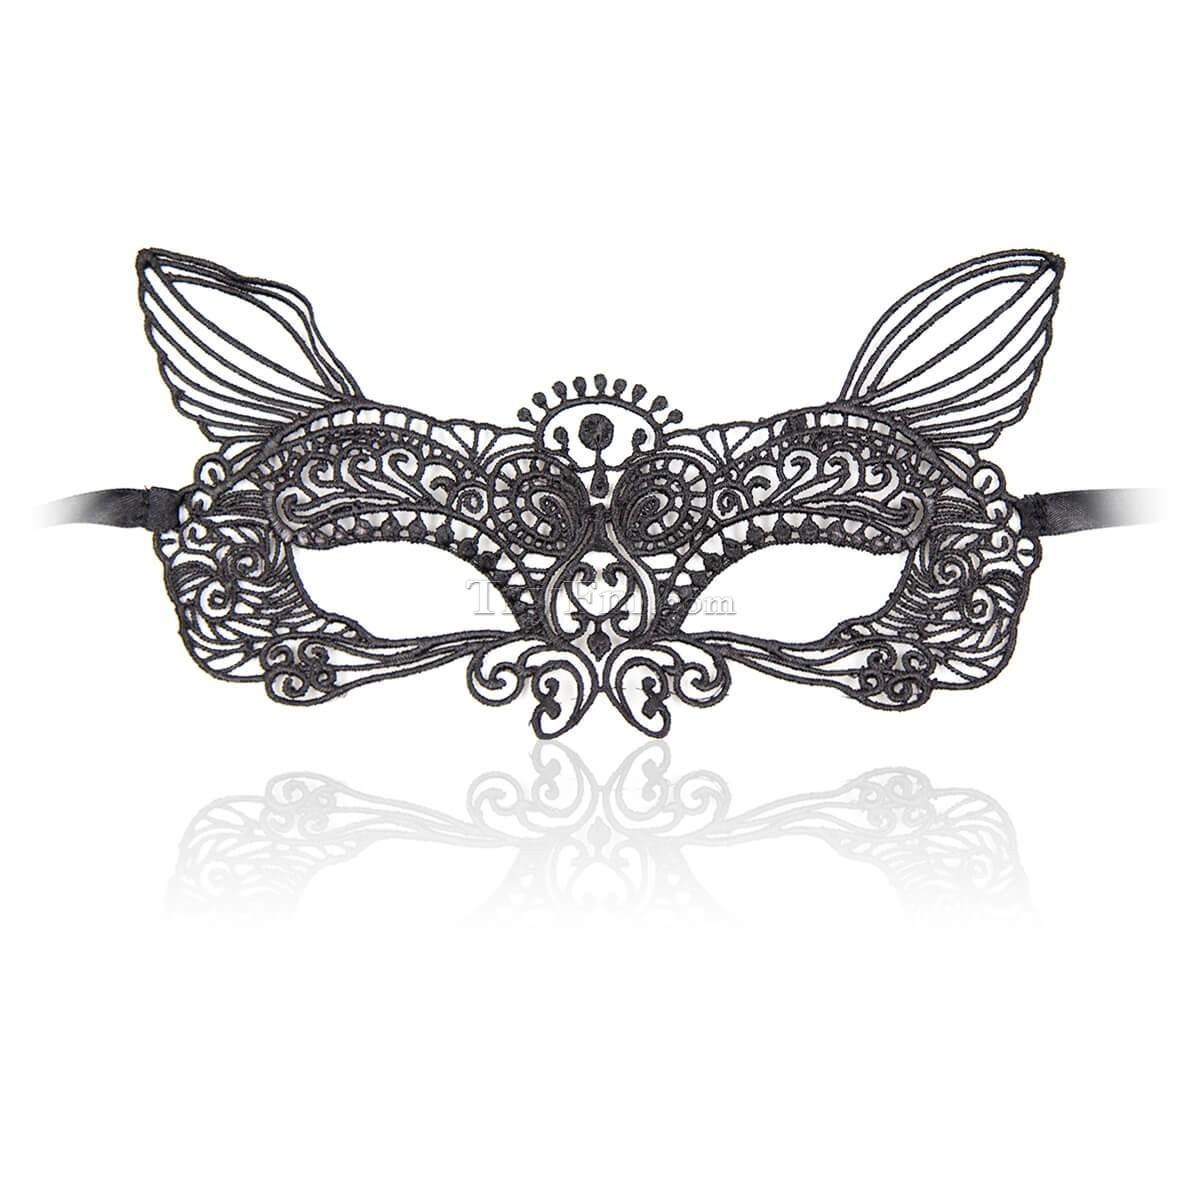 7-black-easy-eye-mask-style-22.jpg